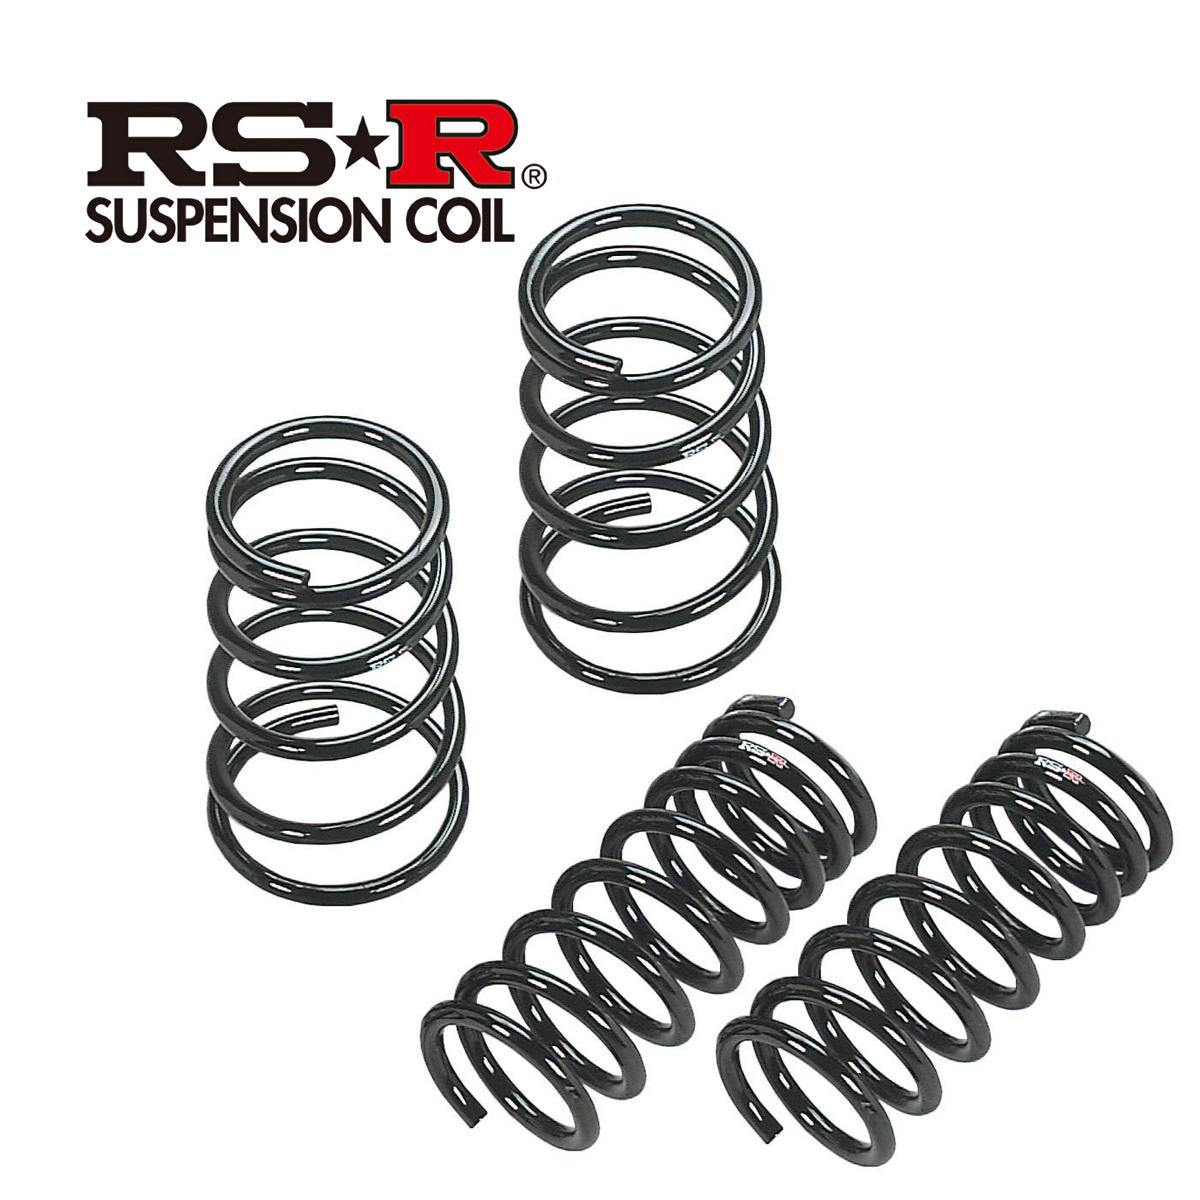 RS-R ジムニーシエラ JB74W JC ダウンサス スプリング リア S662DR RSR ダウン RSR 個人宅発送追金有